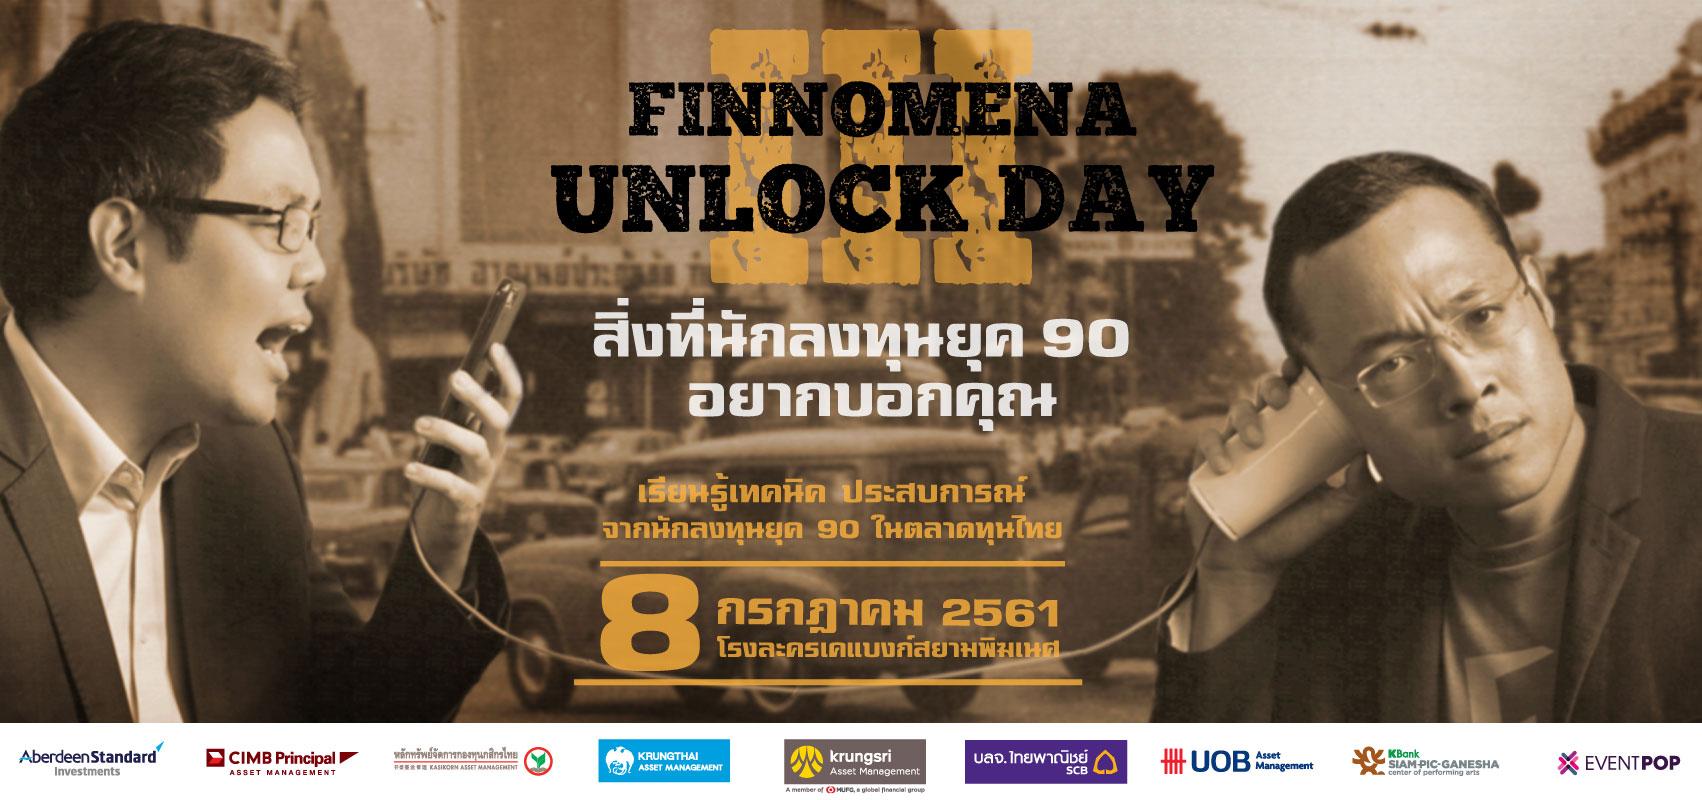 Unlock day iii event pop key